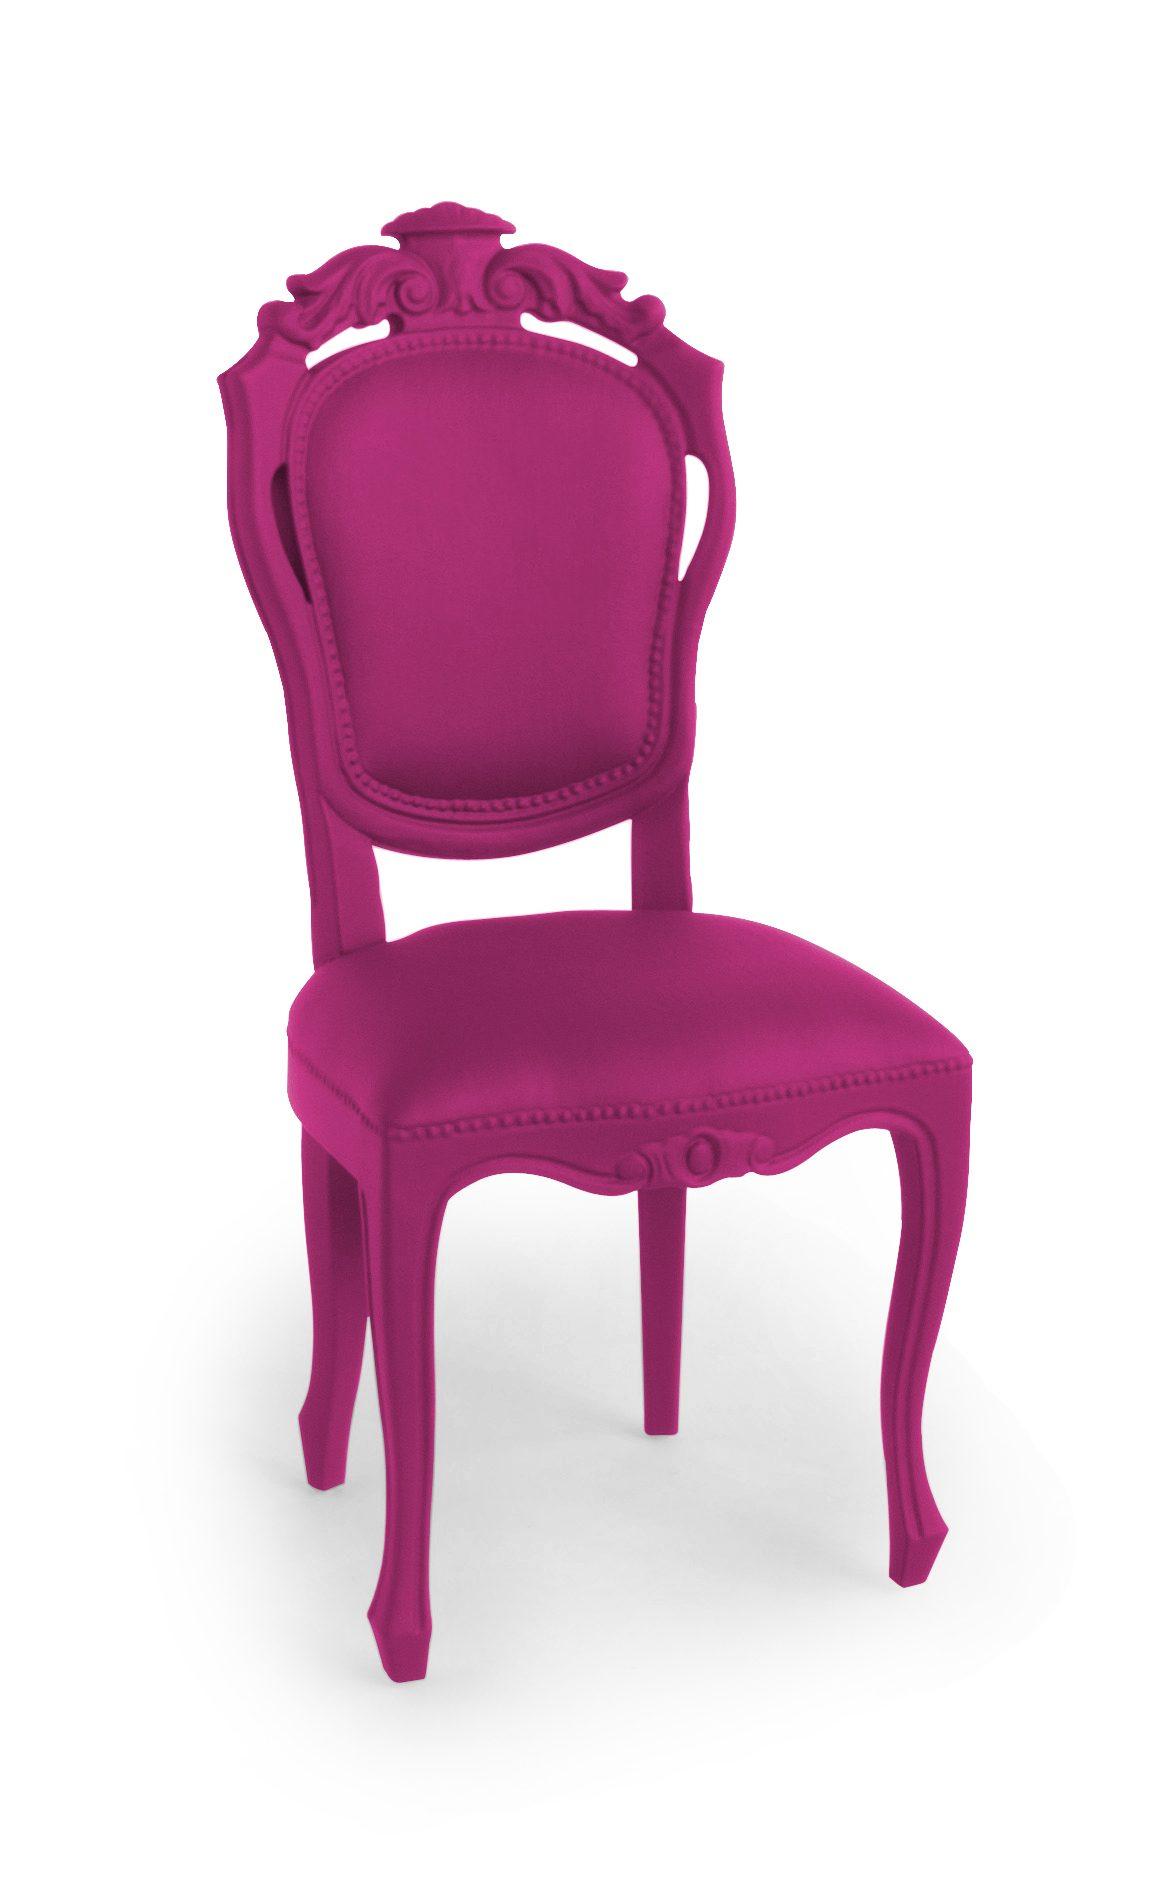 Jspr Plastic Fantastic Dining Chair Pink Roze Stoel Rubber